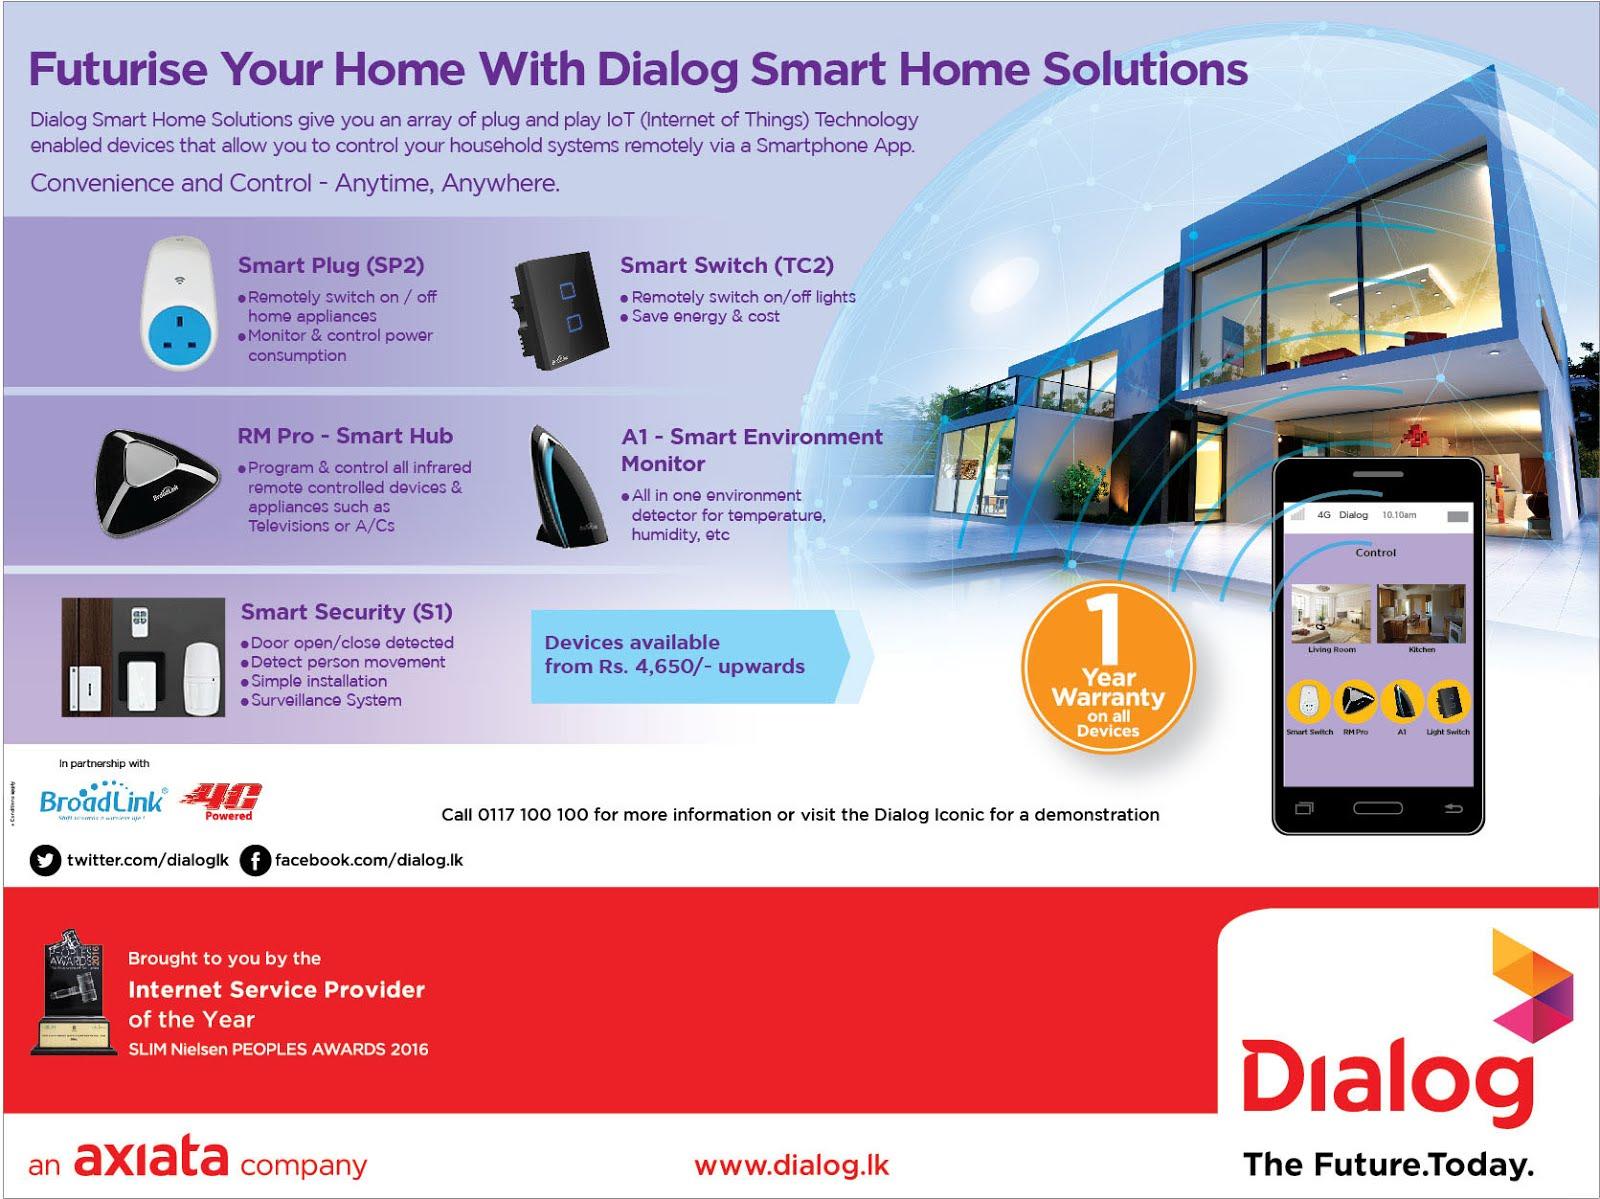 http://www.dilaog.lk/smarthomes